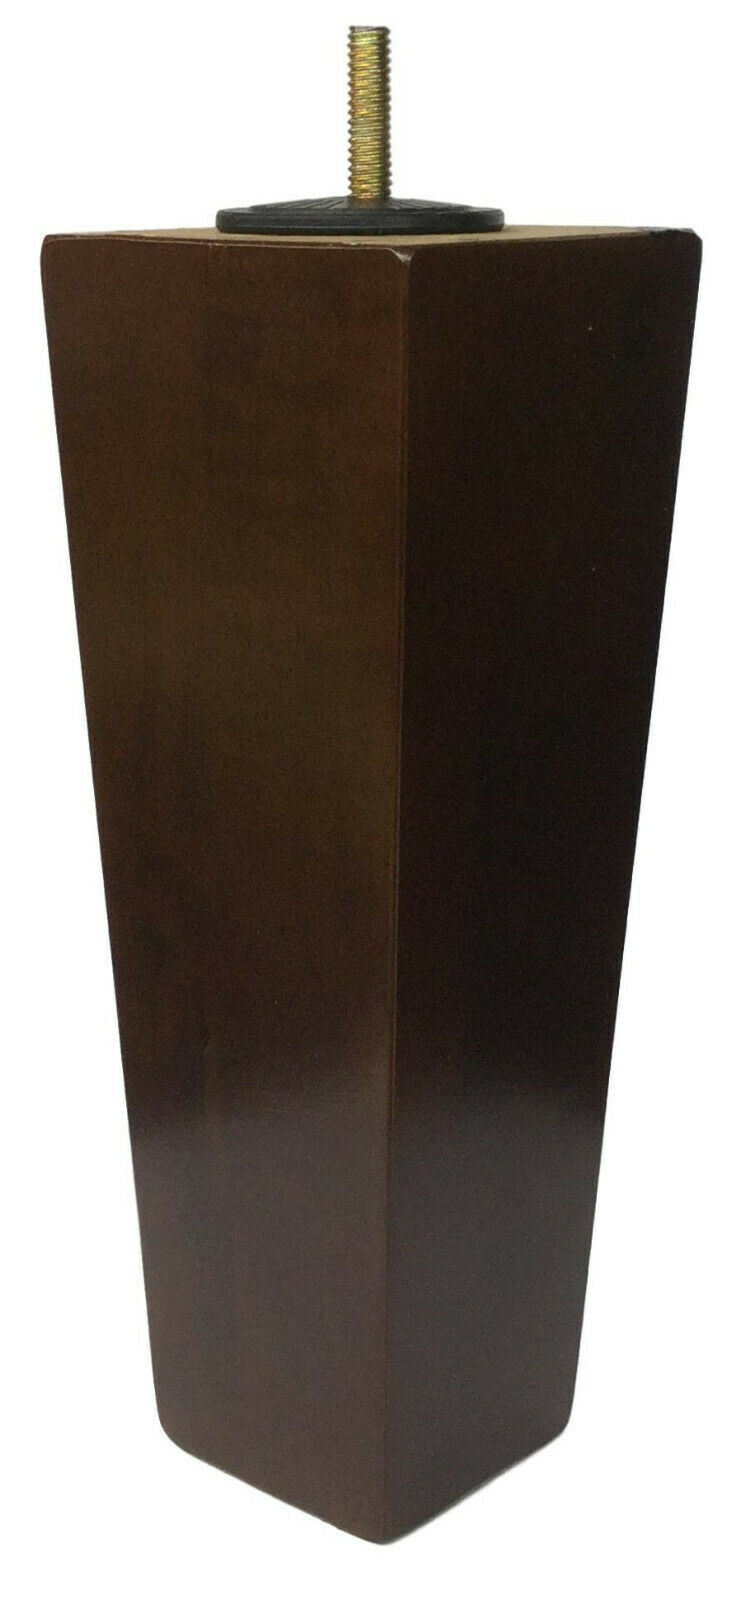 8″ Dark Walnut Tapered Pyramid Sofa/Couch/Chair Wood Legs [5/16″ Bolt] Set of 4 Furniture